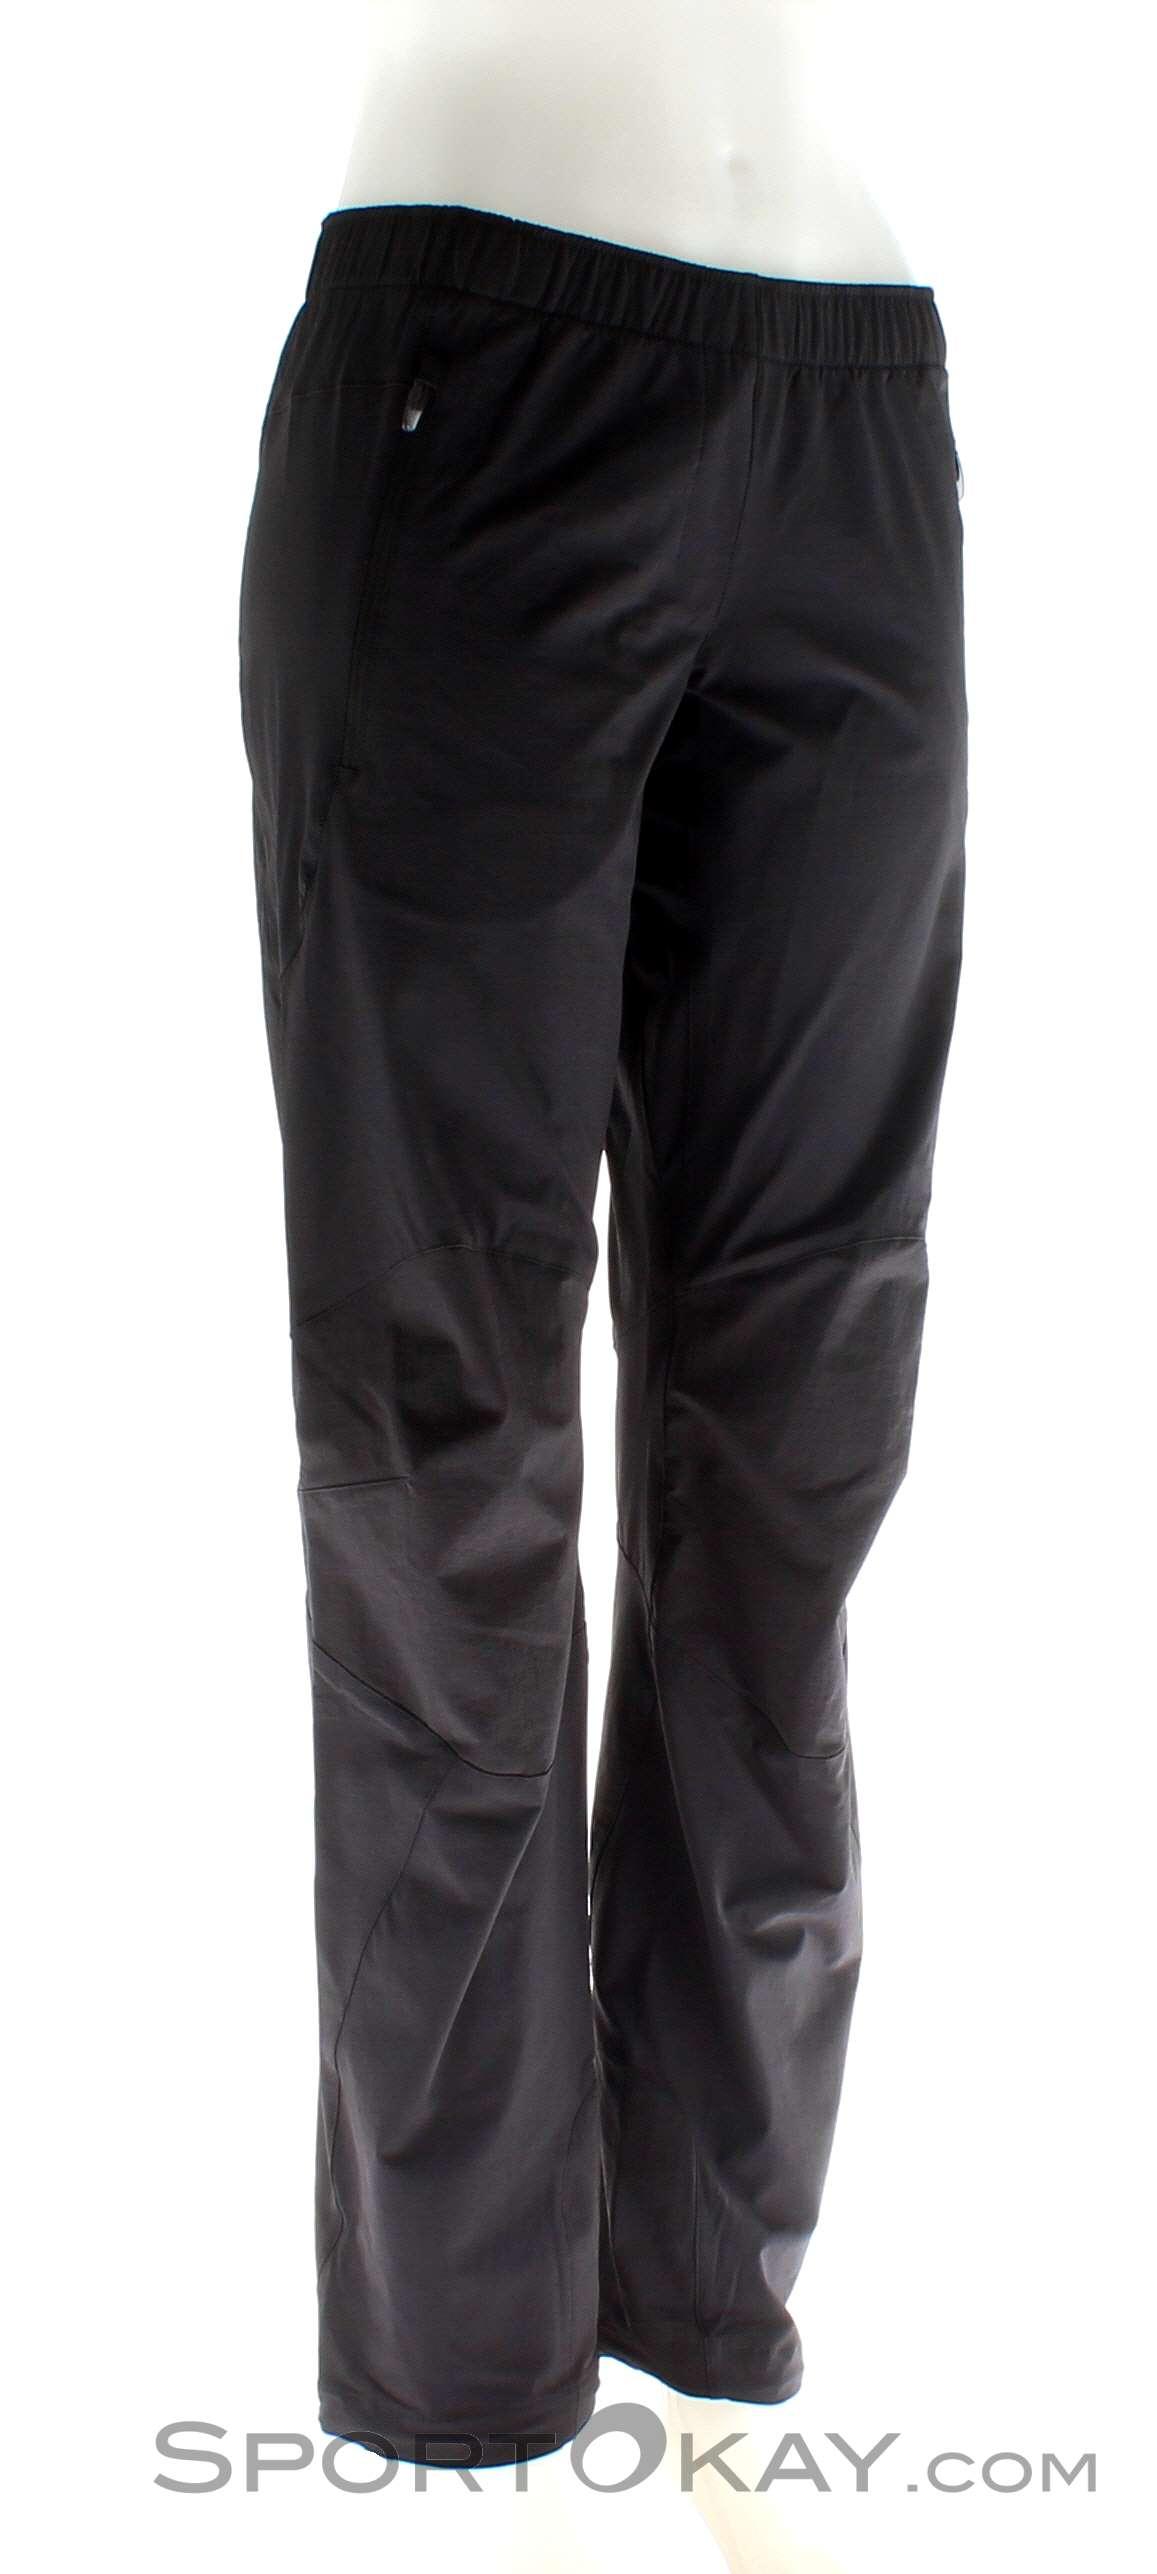 Adidas Multi TX Damen Outdoorhose-Schwarz-36